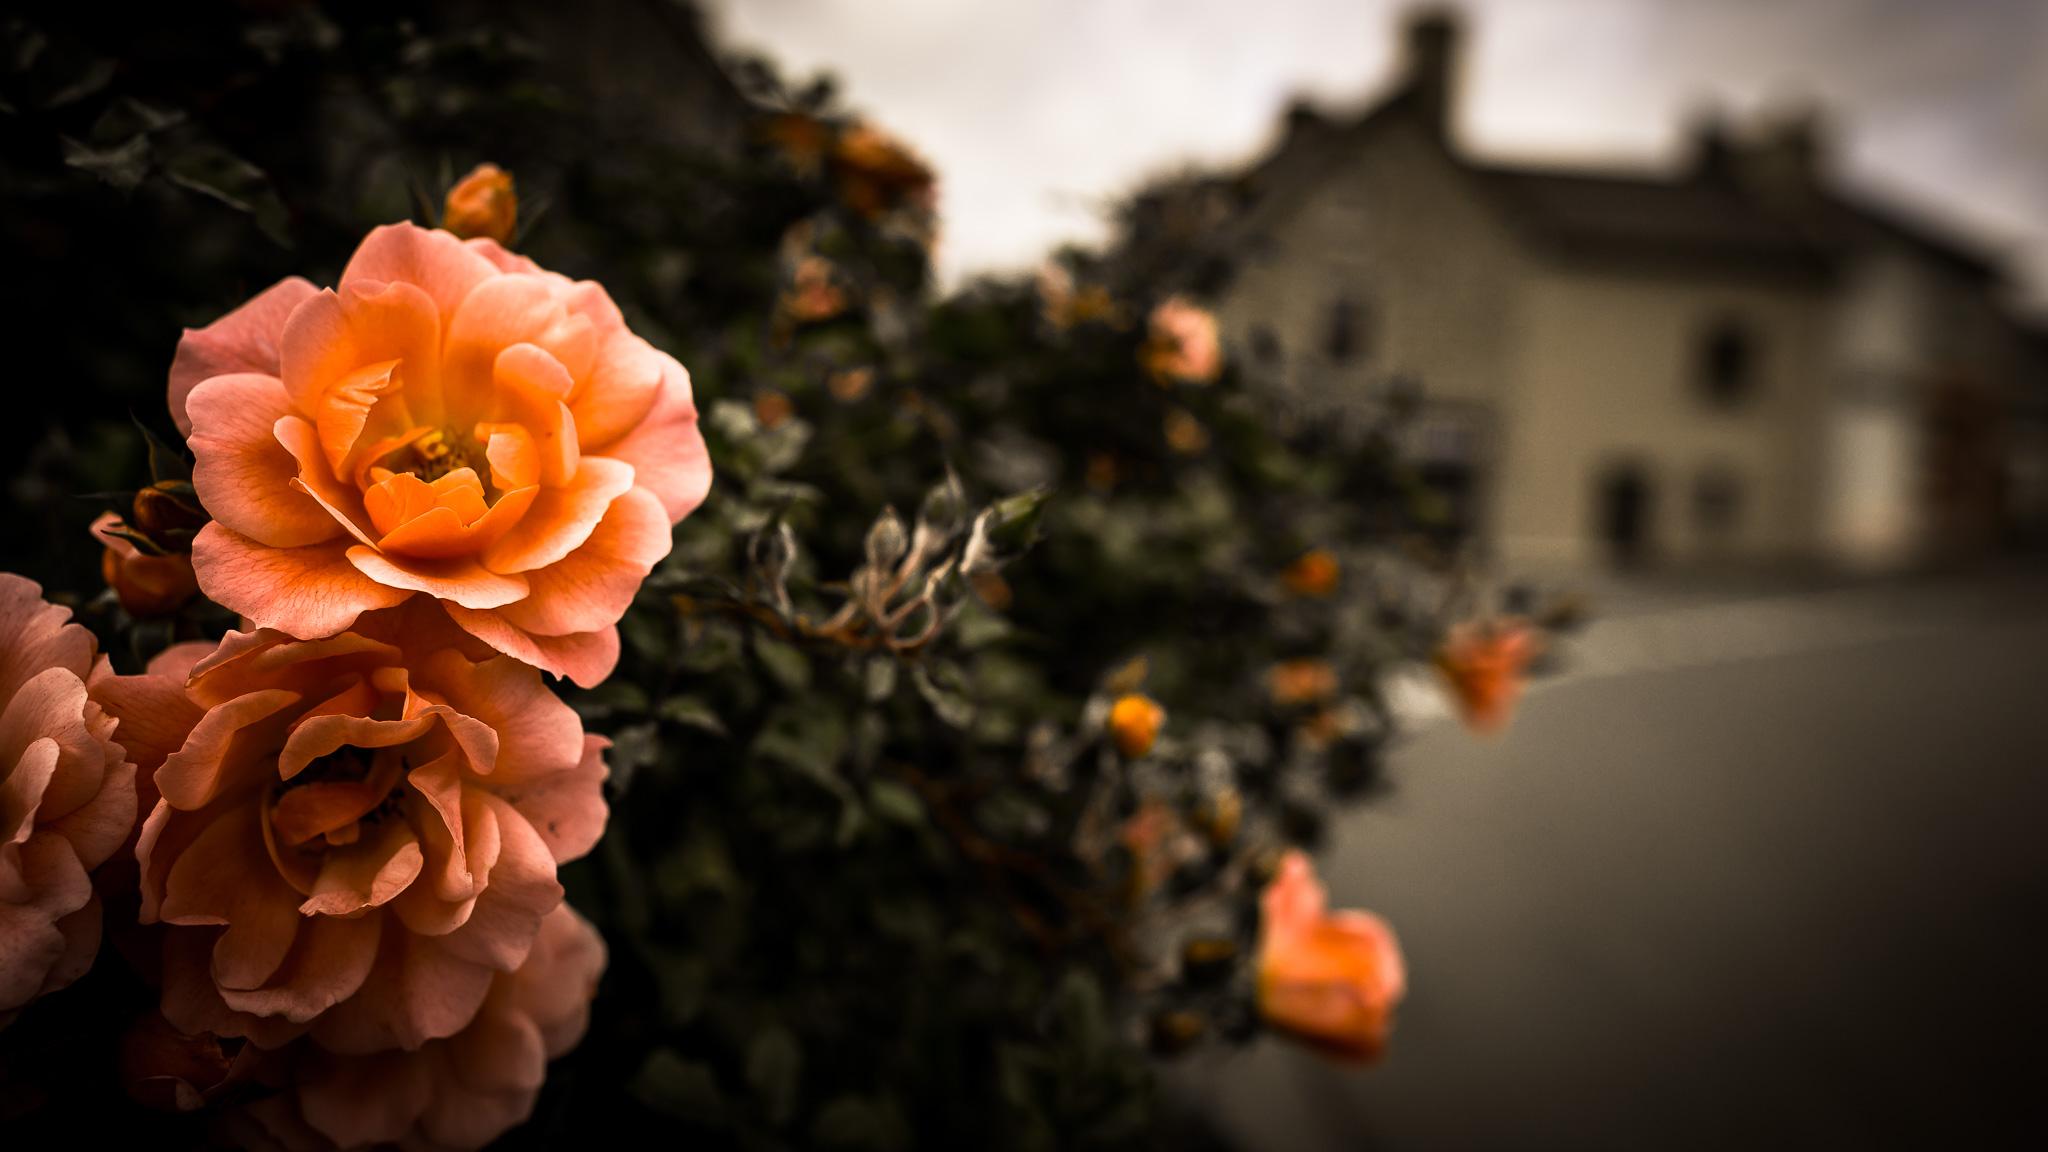 Flowers Ernée Street 2015 MXoN